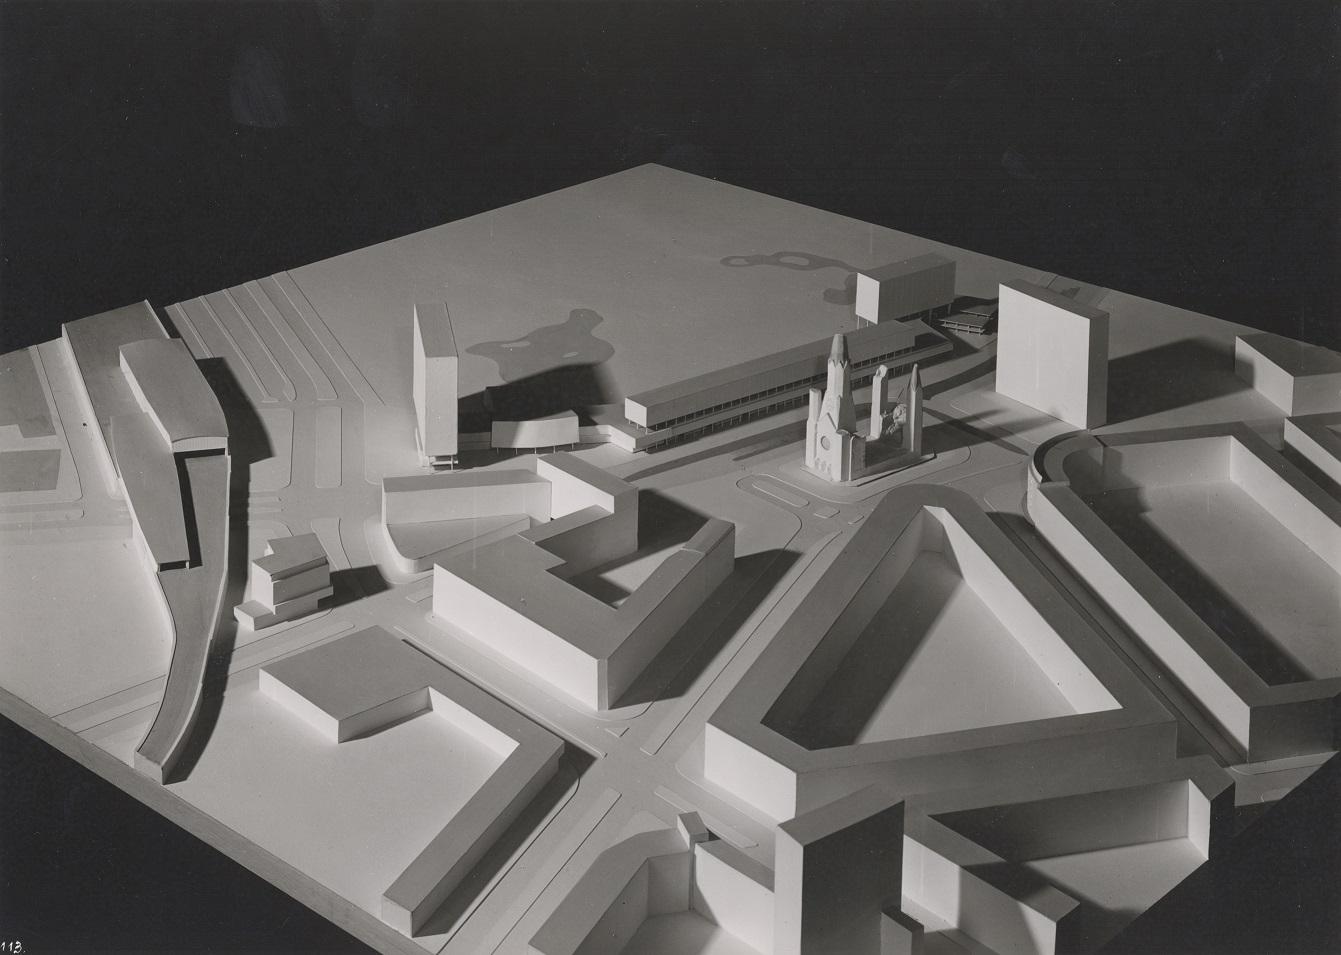 Berlin, Bikini-Haus, Modell (Bild: Archiv Paul Schwebes)